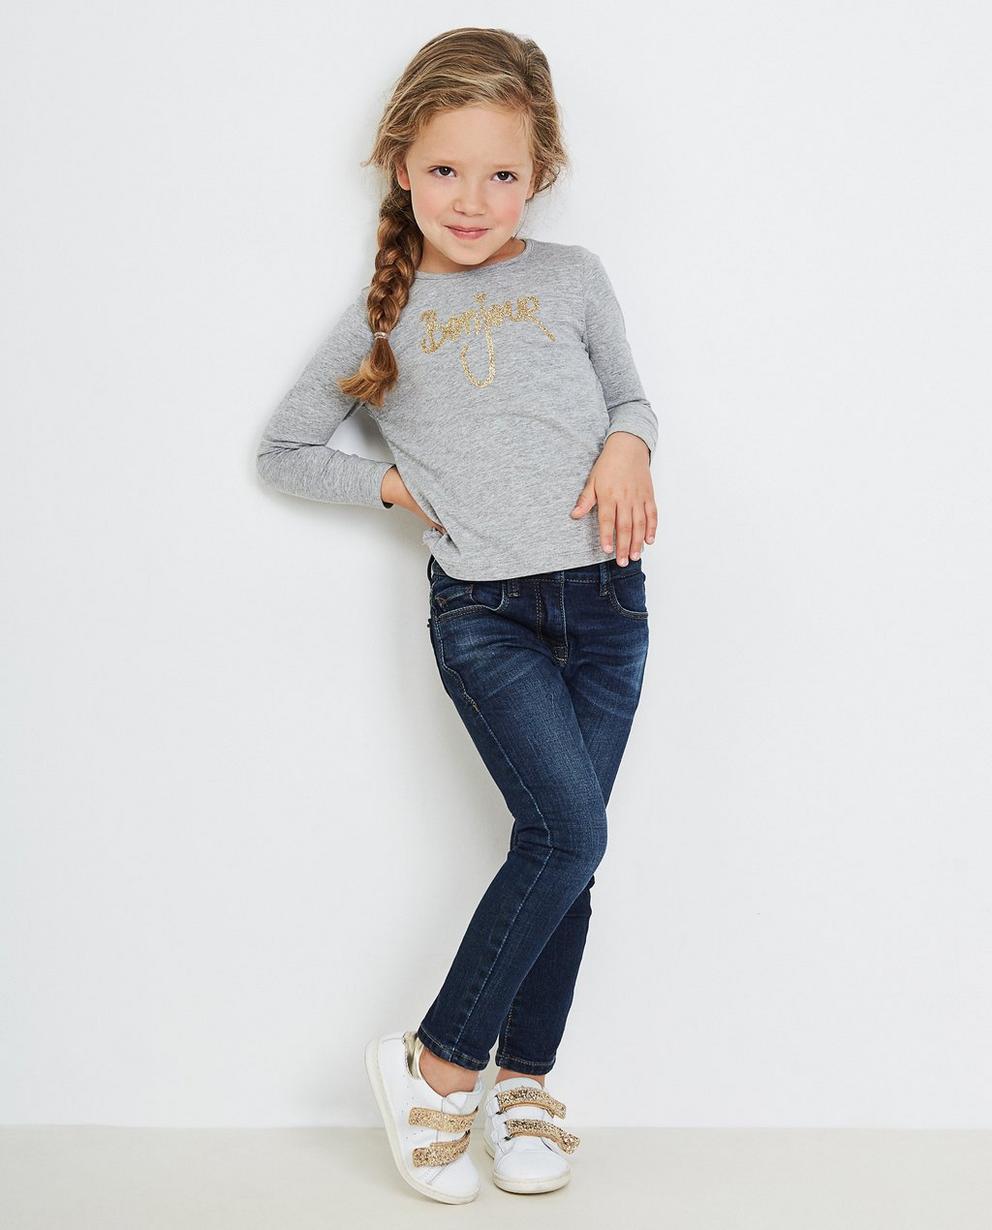 T-shirt à manches longues - bleu, paillettes, BESTies - Besties